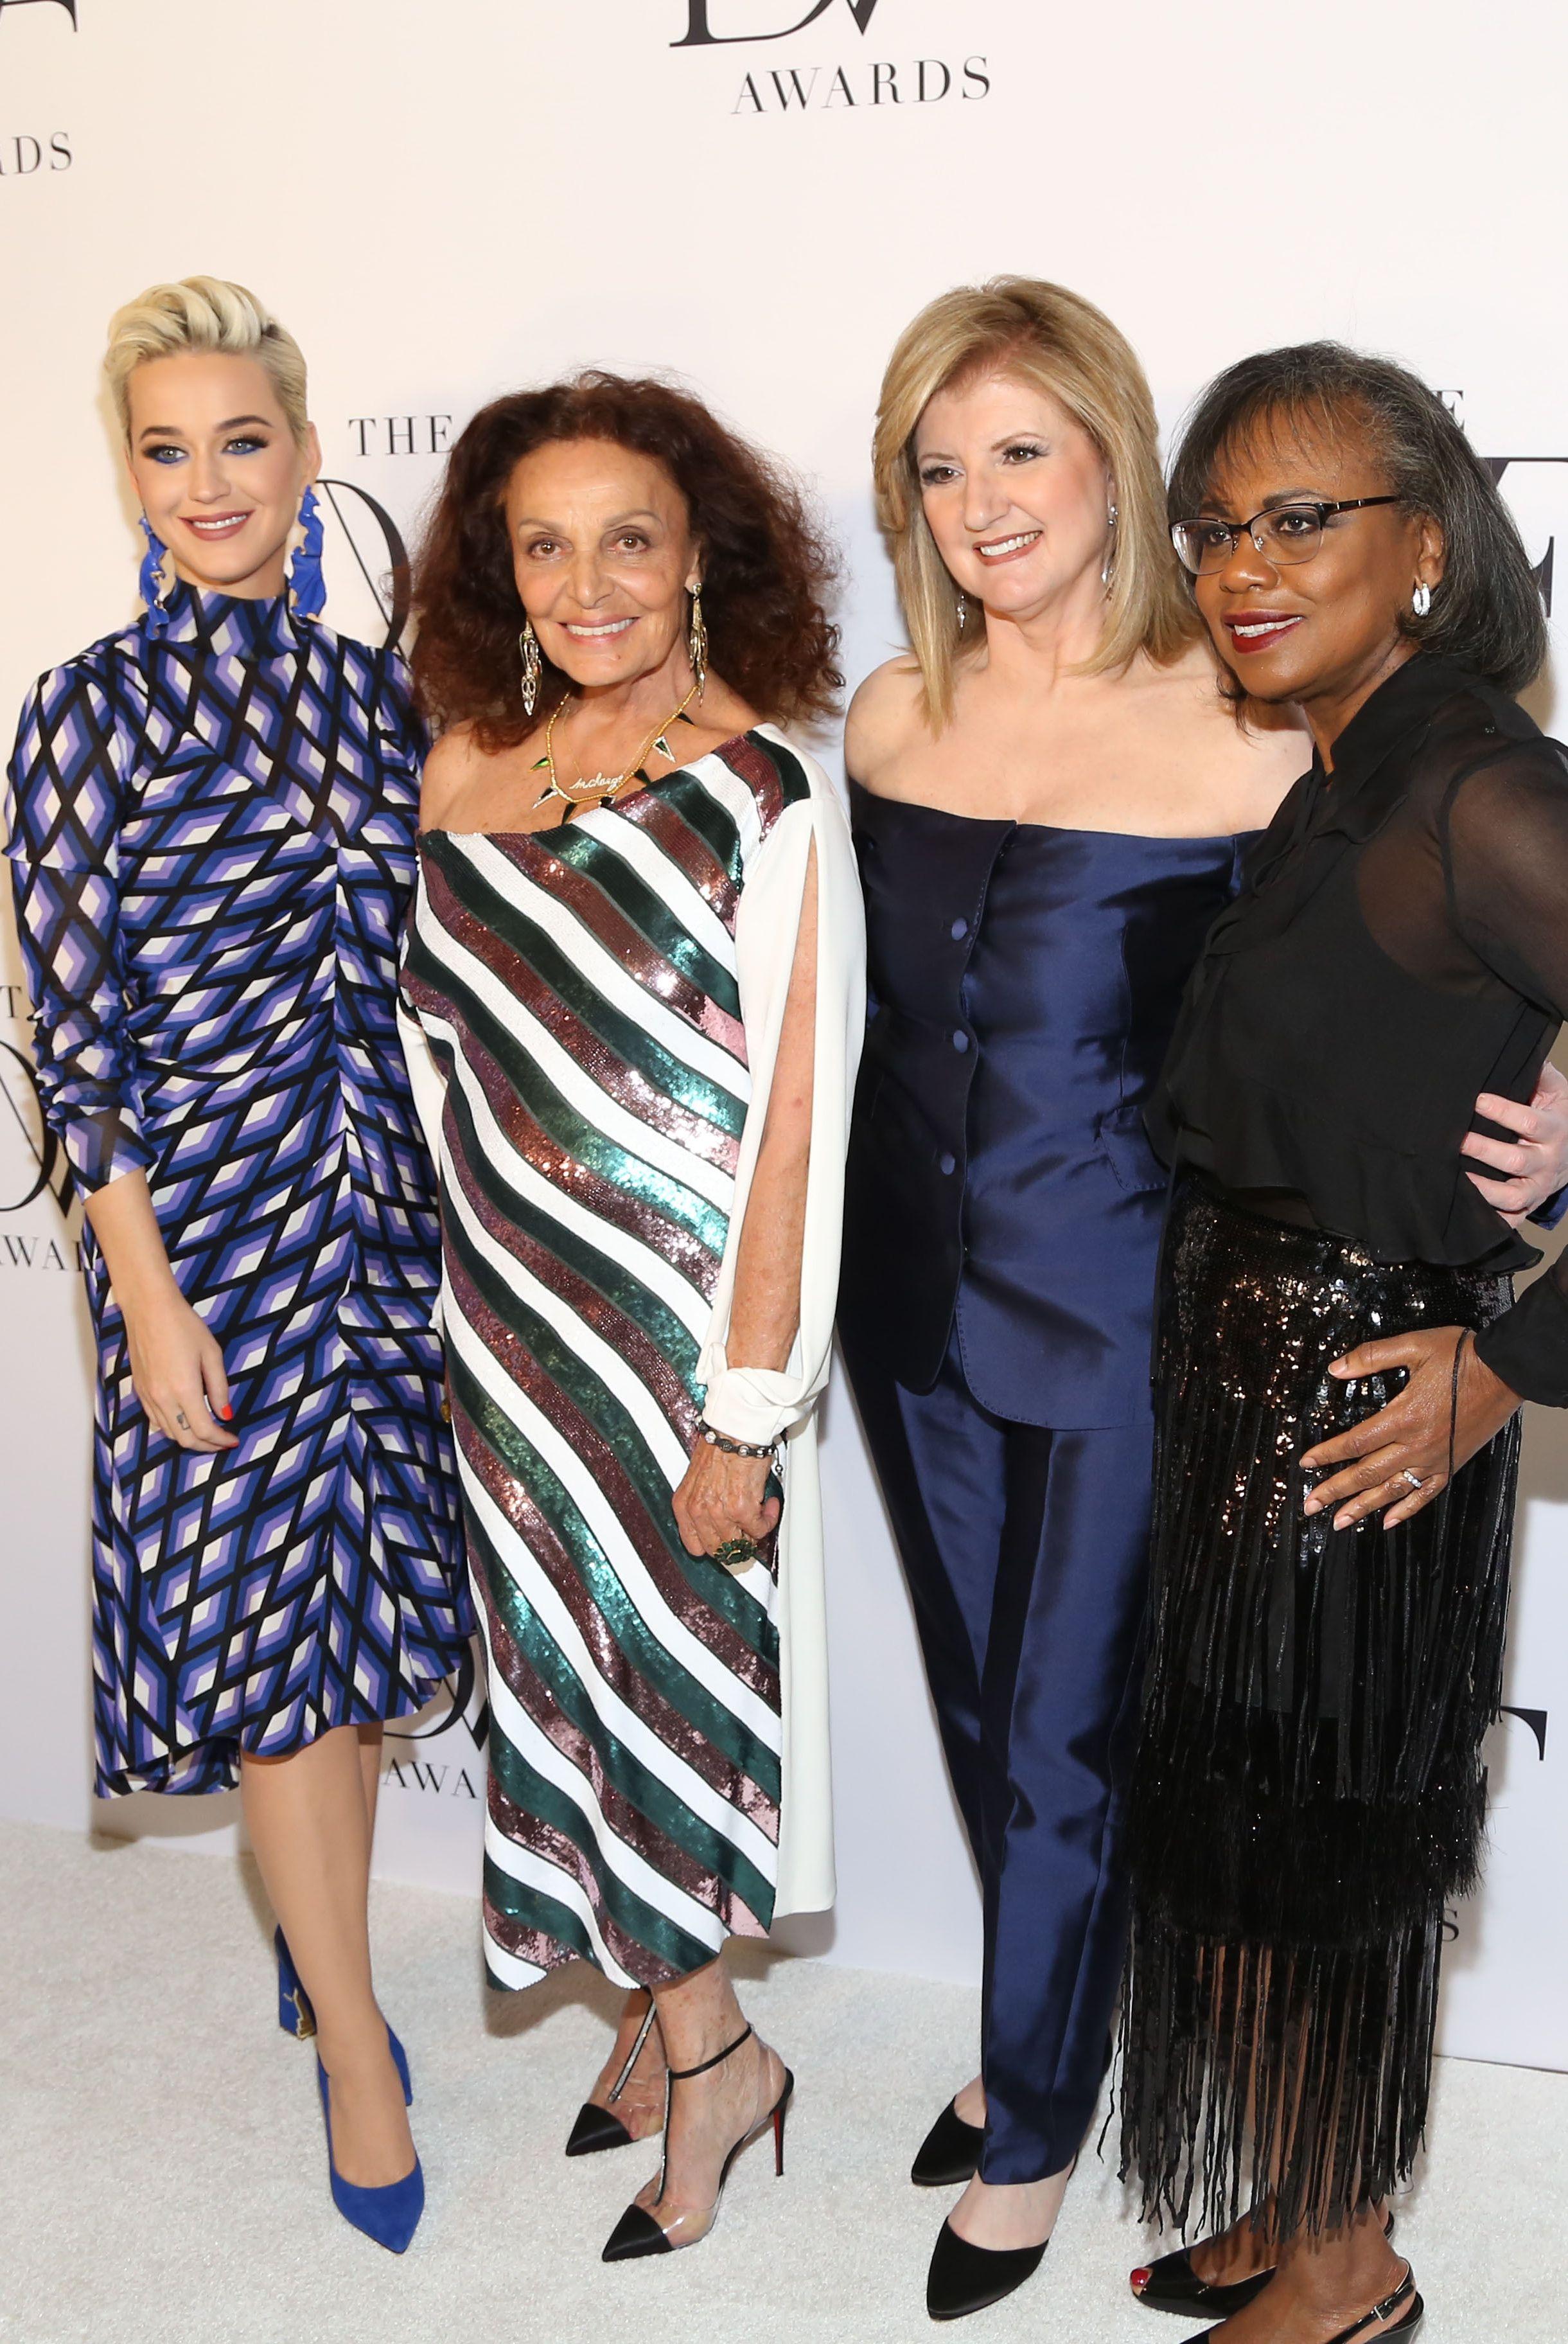 Katy Perry, DVF, Arianna Huffington, and Anita Hill